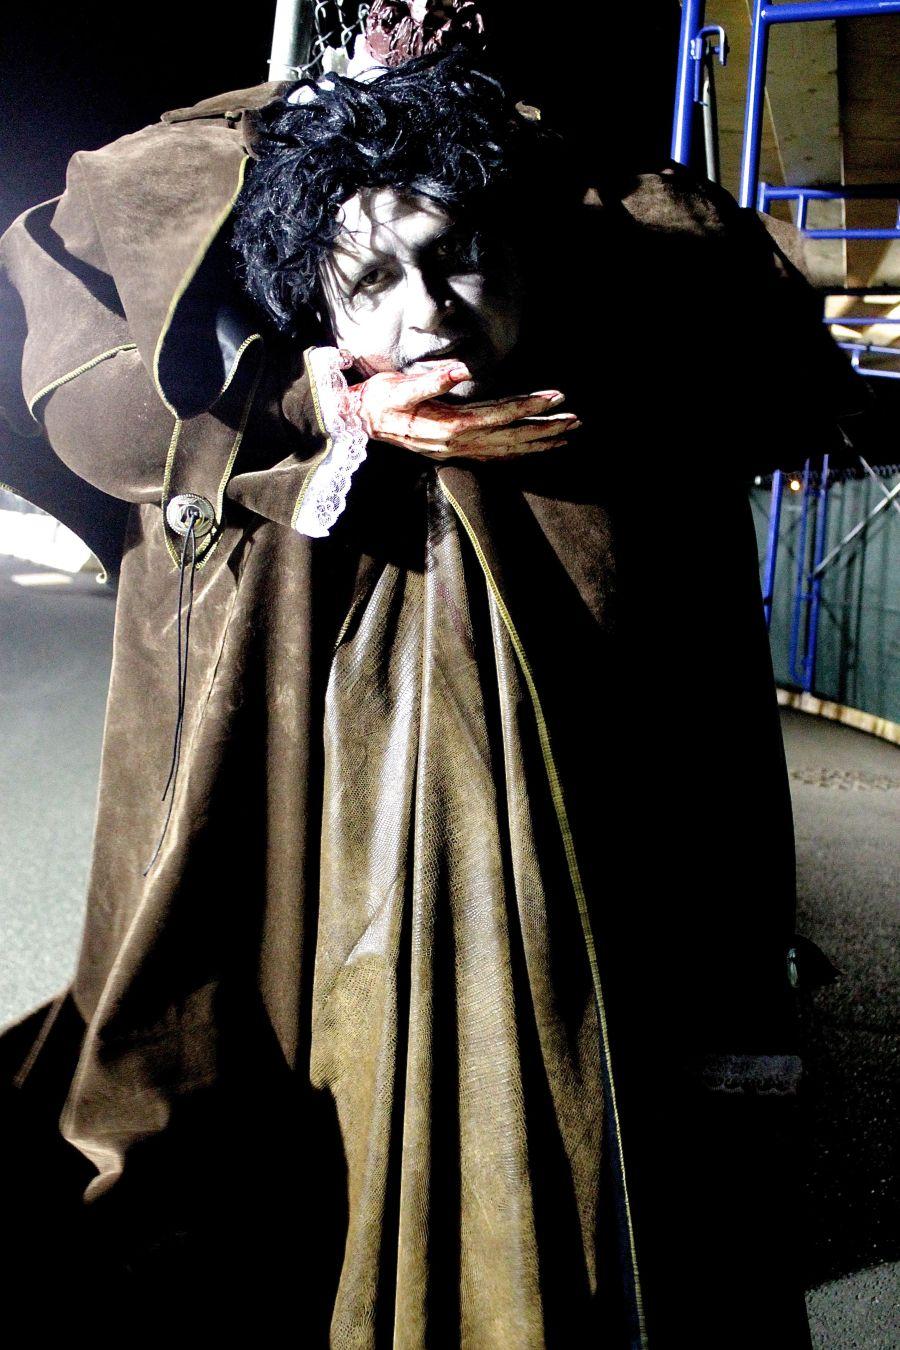 salem halloween 2013 headless costume